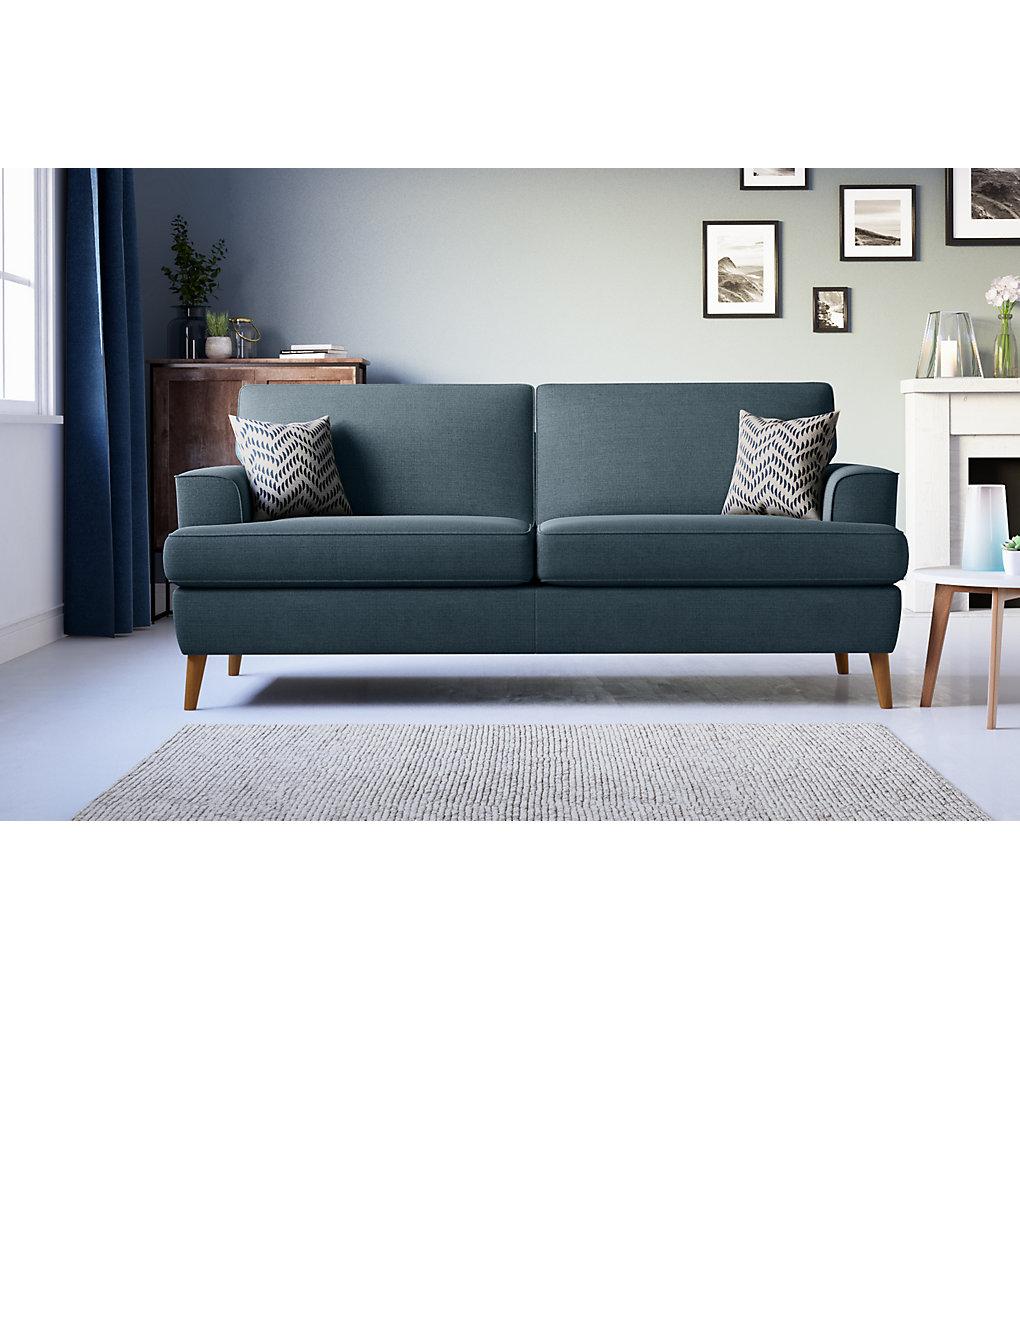 copenhagen sofa serta at home copenhagen sofa reviews wayfair thesofa. Black Bedroom Furniture Sets. Home Design Ideas